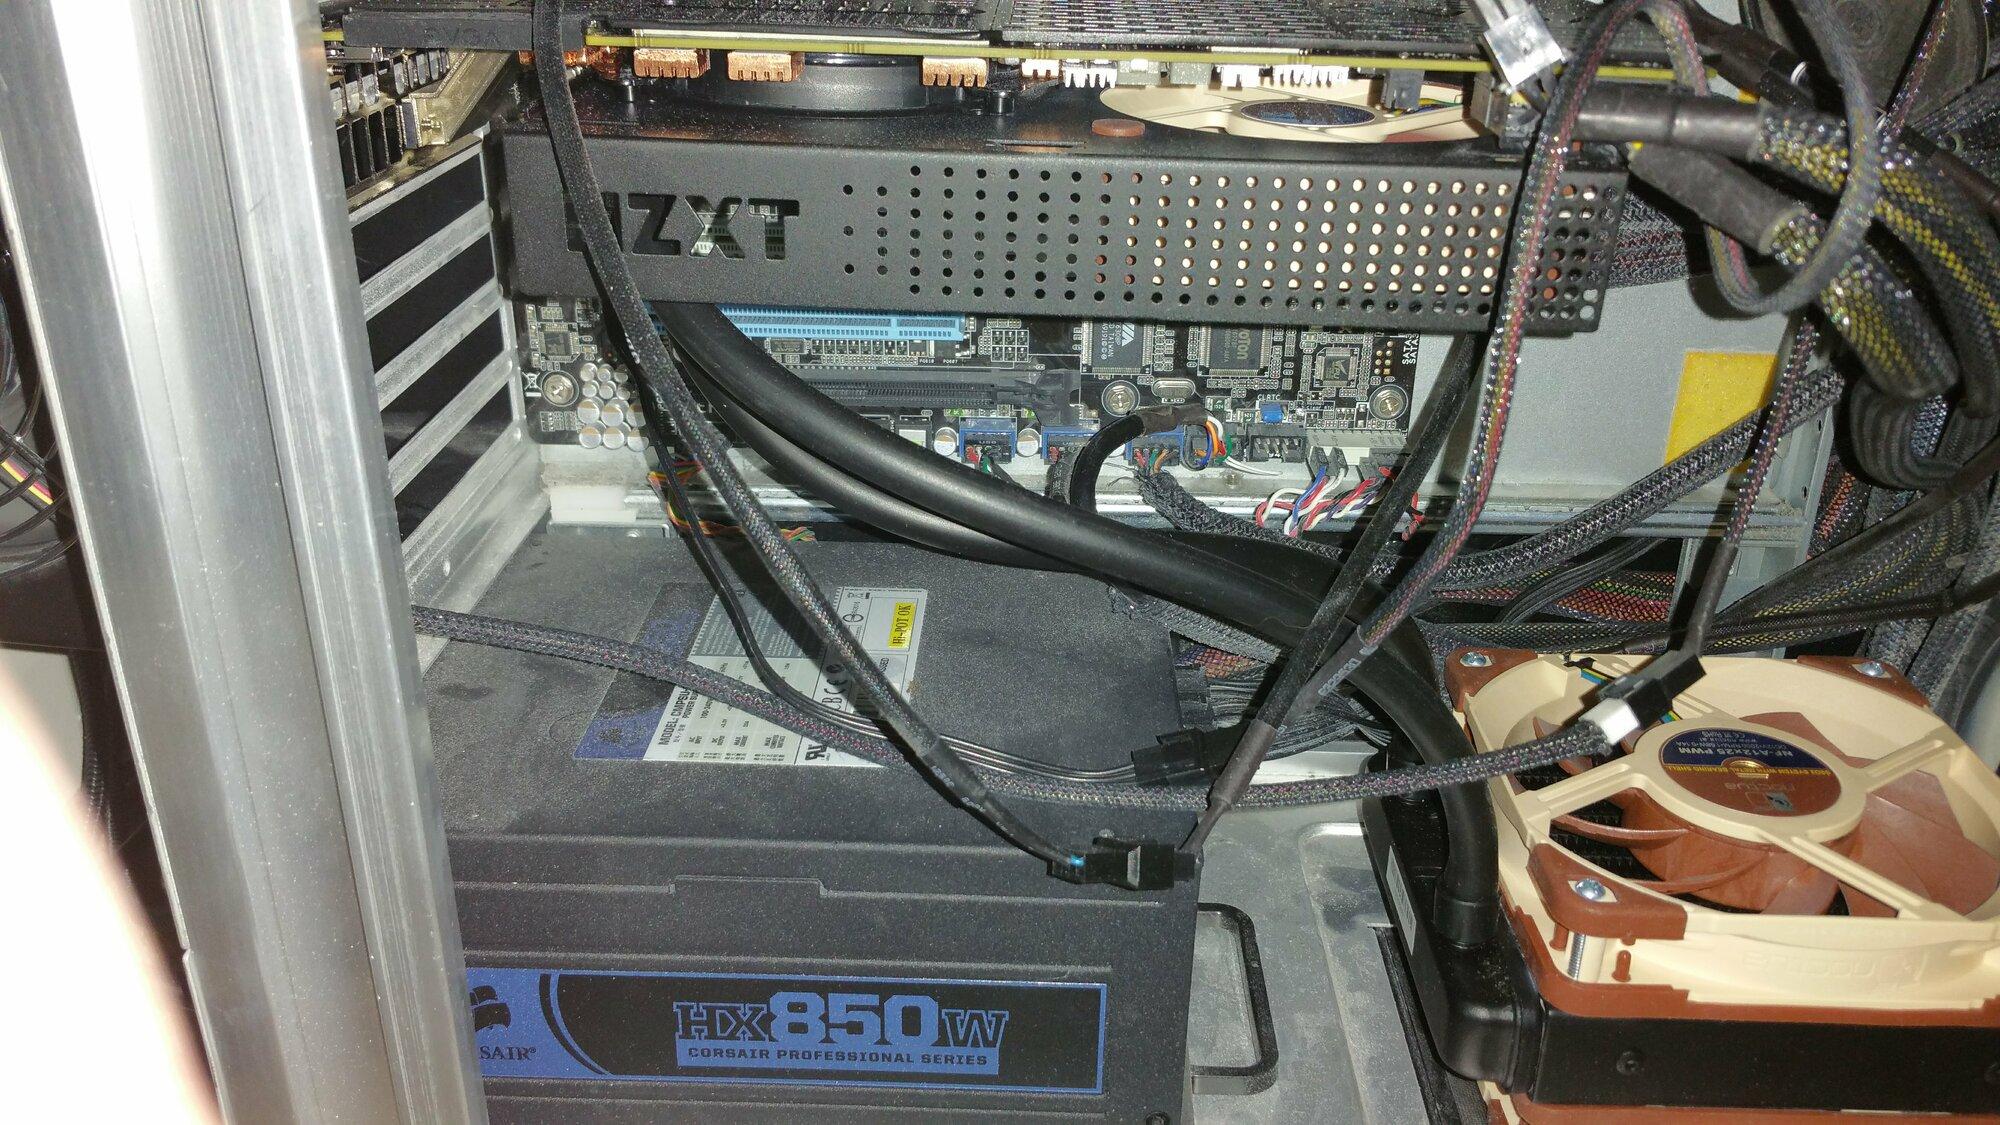 Which GPU Cooler? Kraken G12 + H55, Arctic AcceleroIII/IV